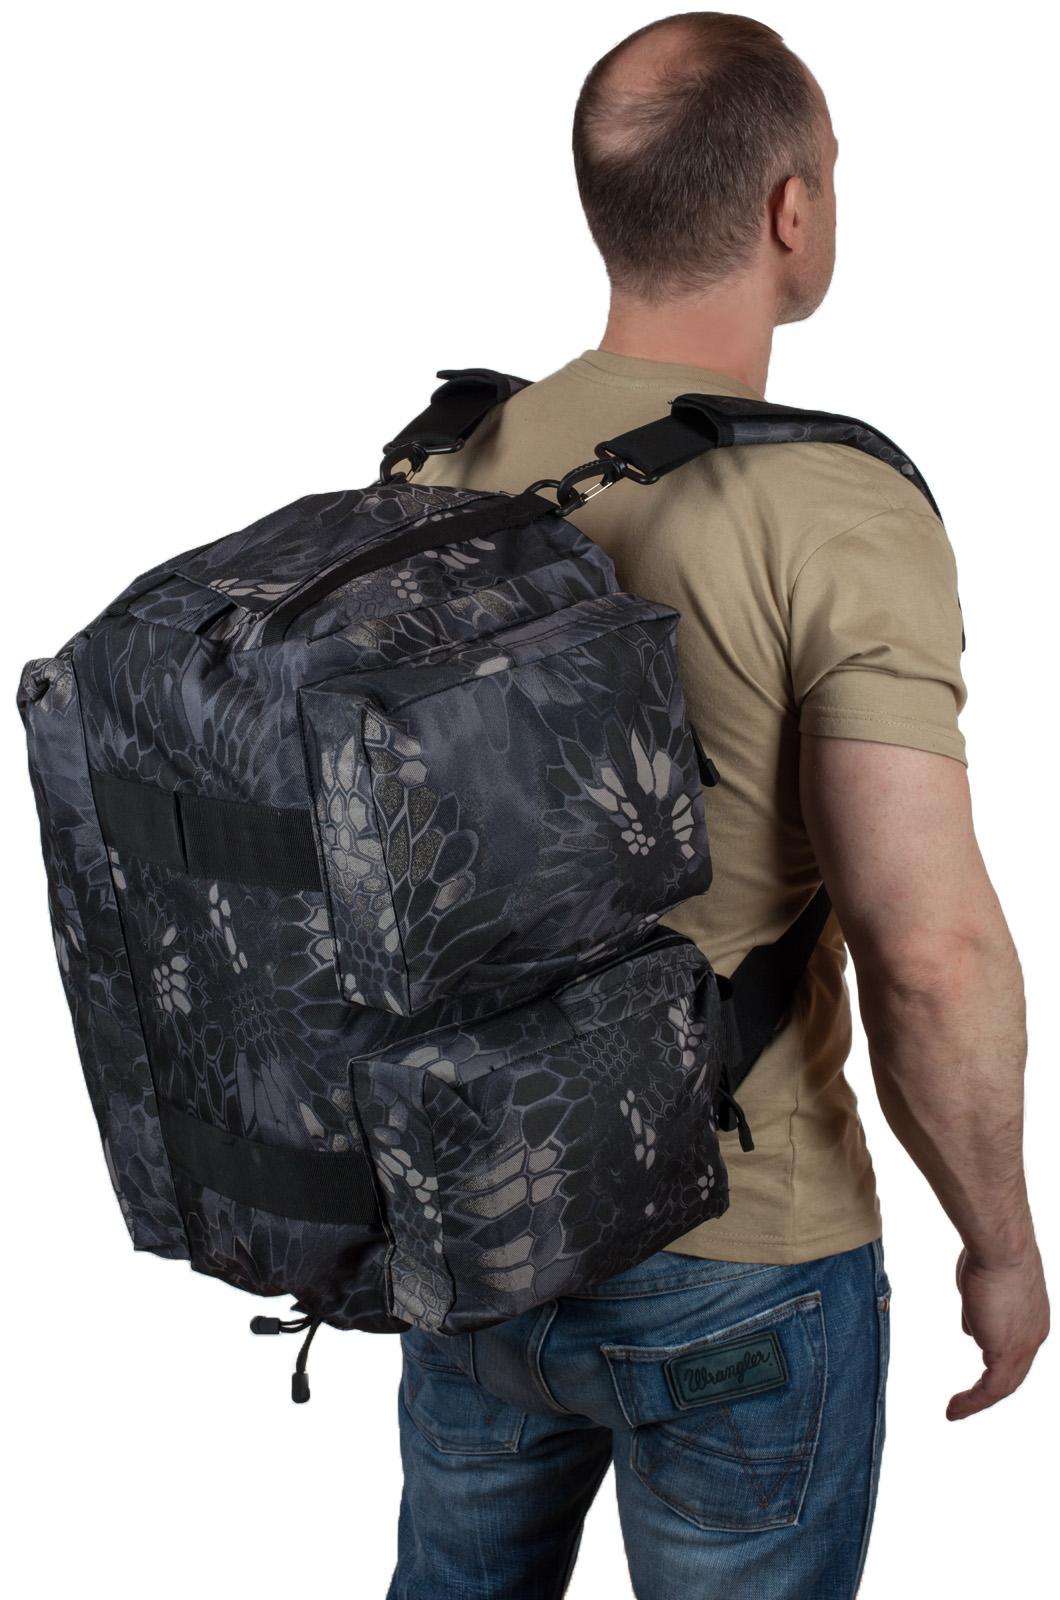 Мужская дорожная сумка-рюкзак Ни пуха, Ни пера - заказать онлайн